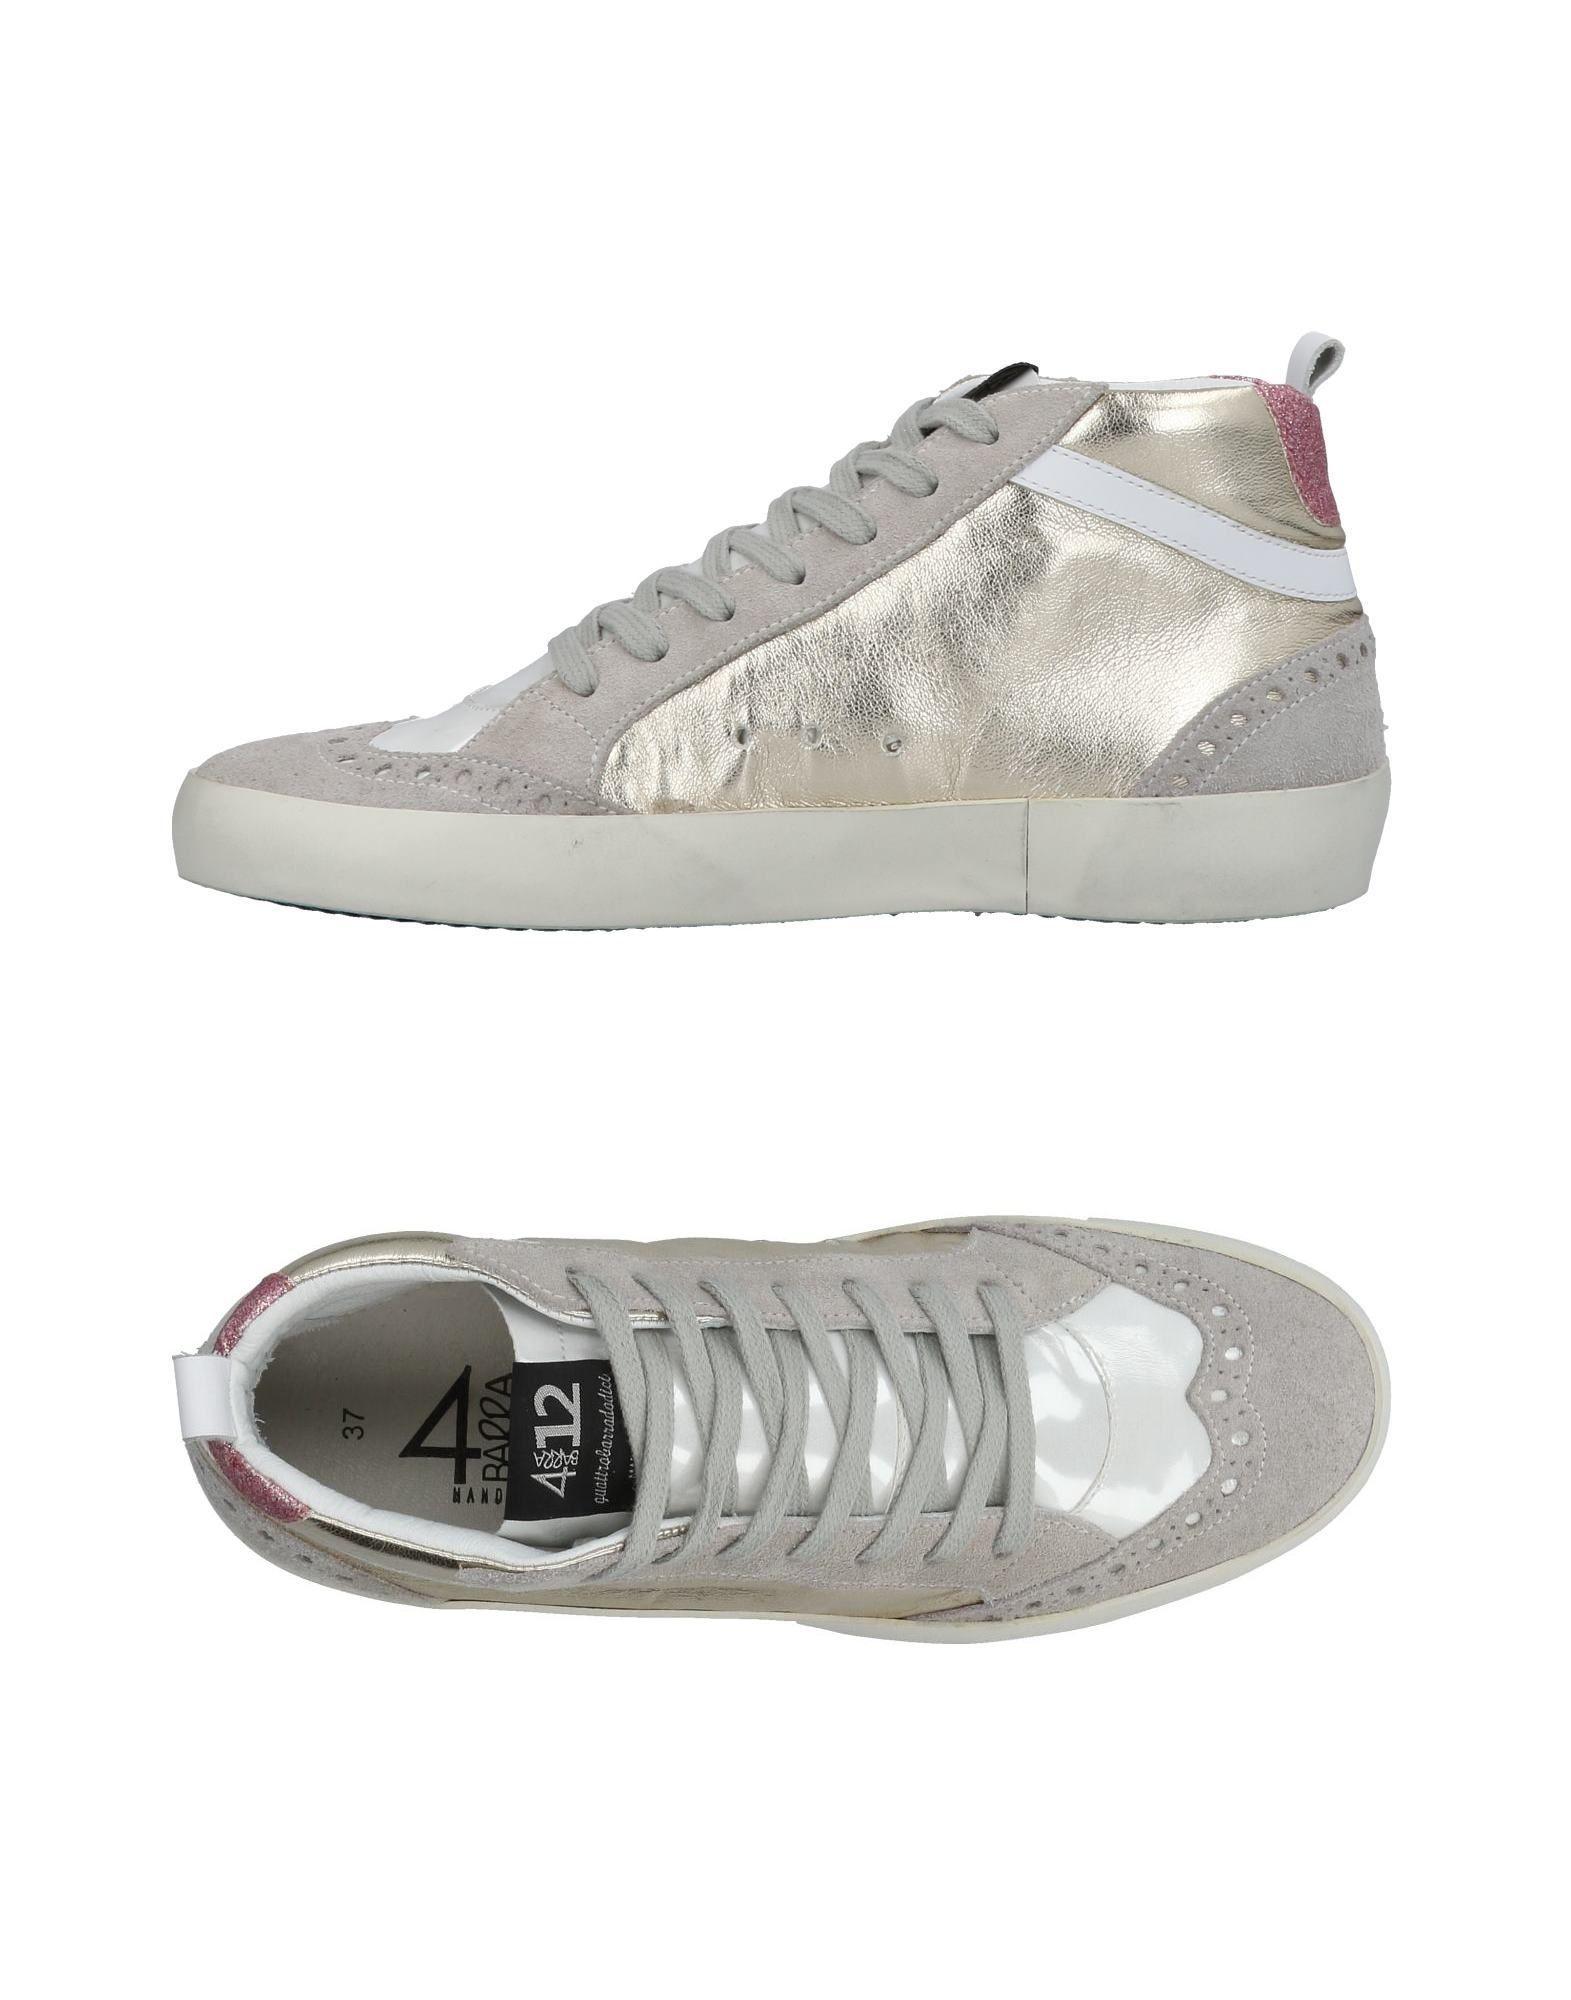 Quattrobarradodici Sneakers Sneakers Quattrobarradodici Damen  11434307GX Gute Qualität beliebte Schuhe 17b5a7